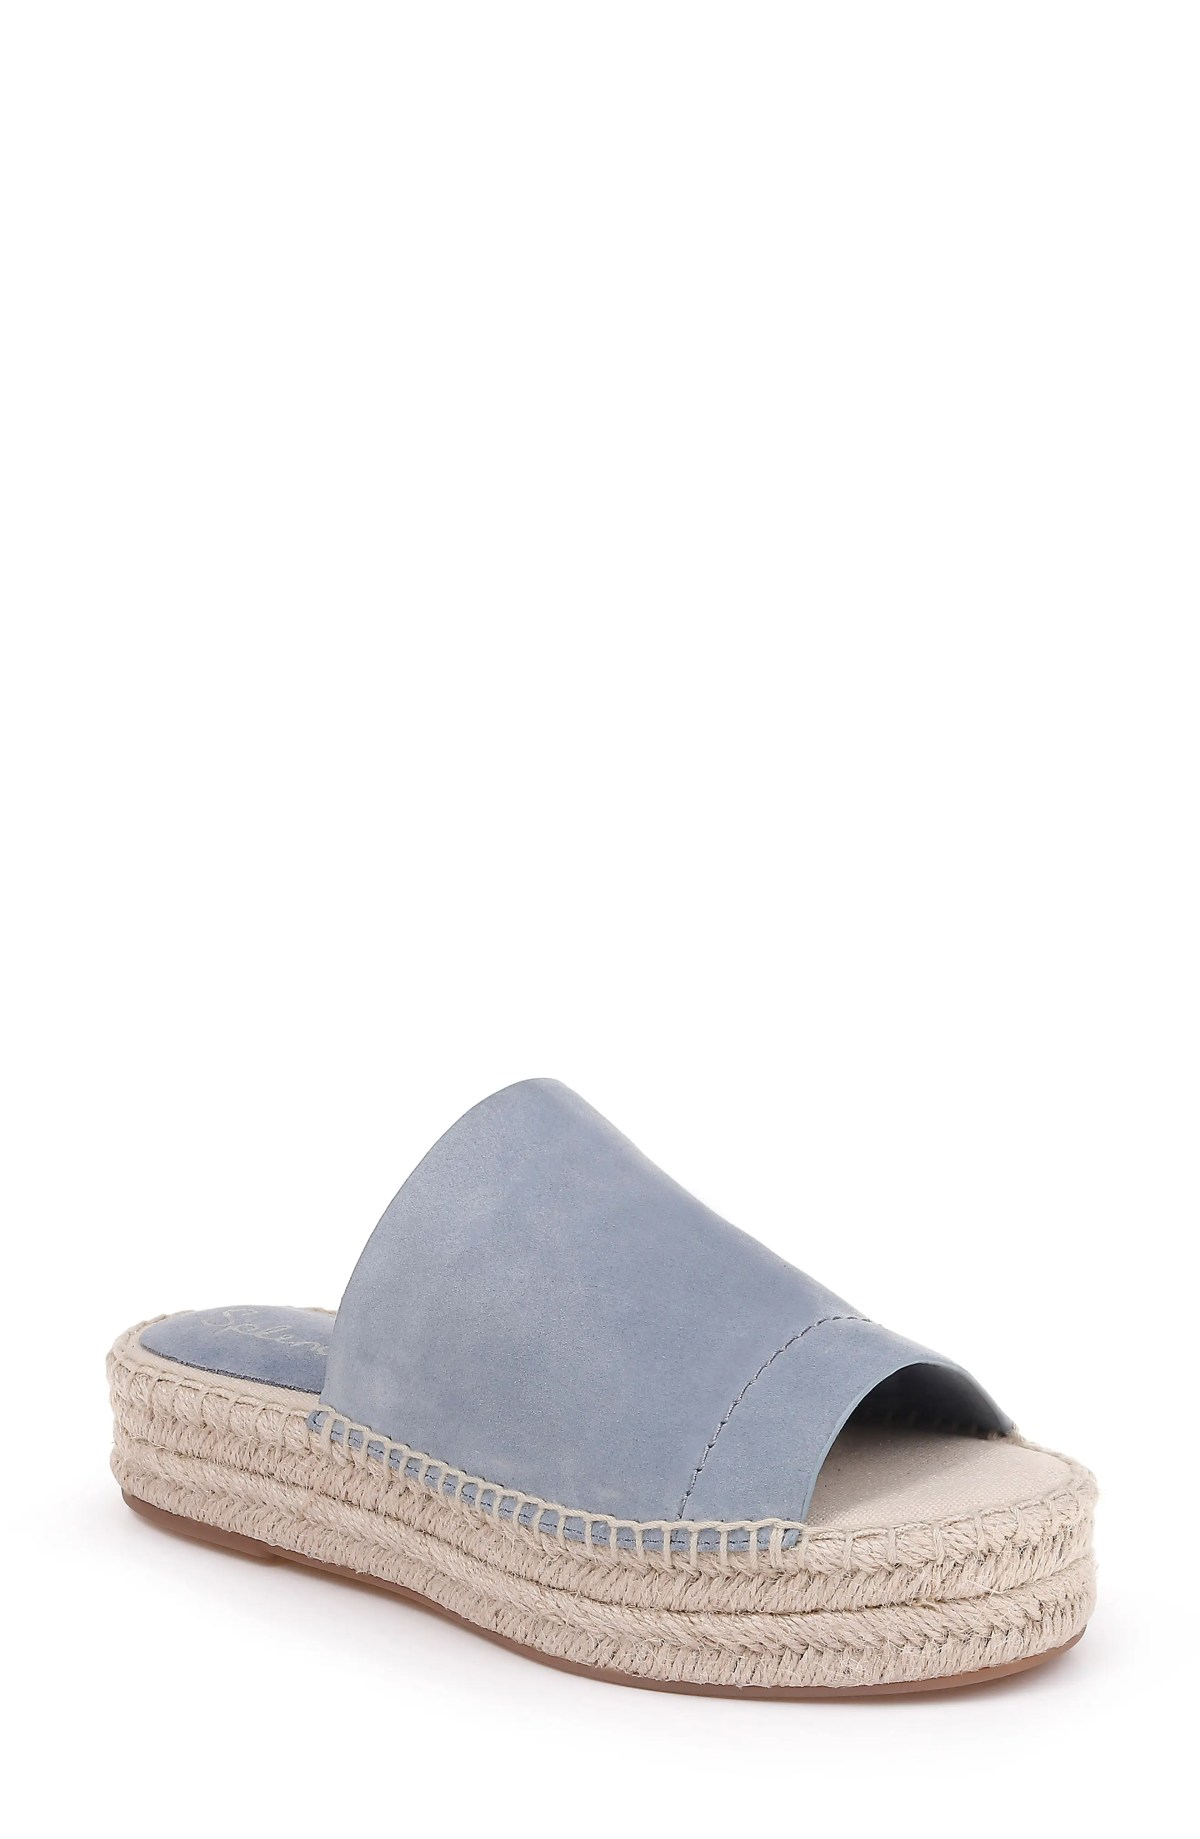 SPLENDID Thaddeus Espadrille Slide Sandal, Main, color, LIGHT BLUE SUEDE